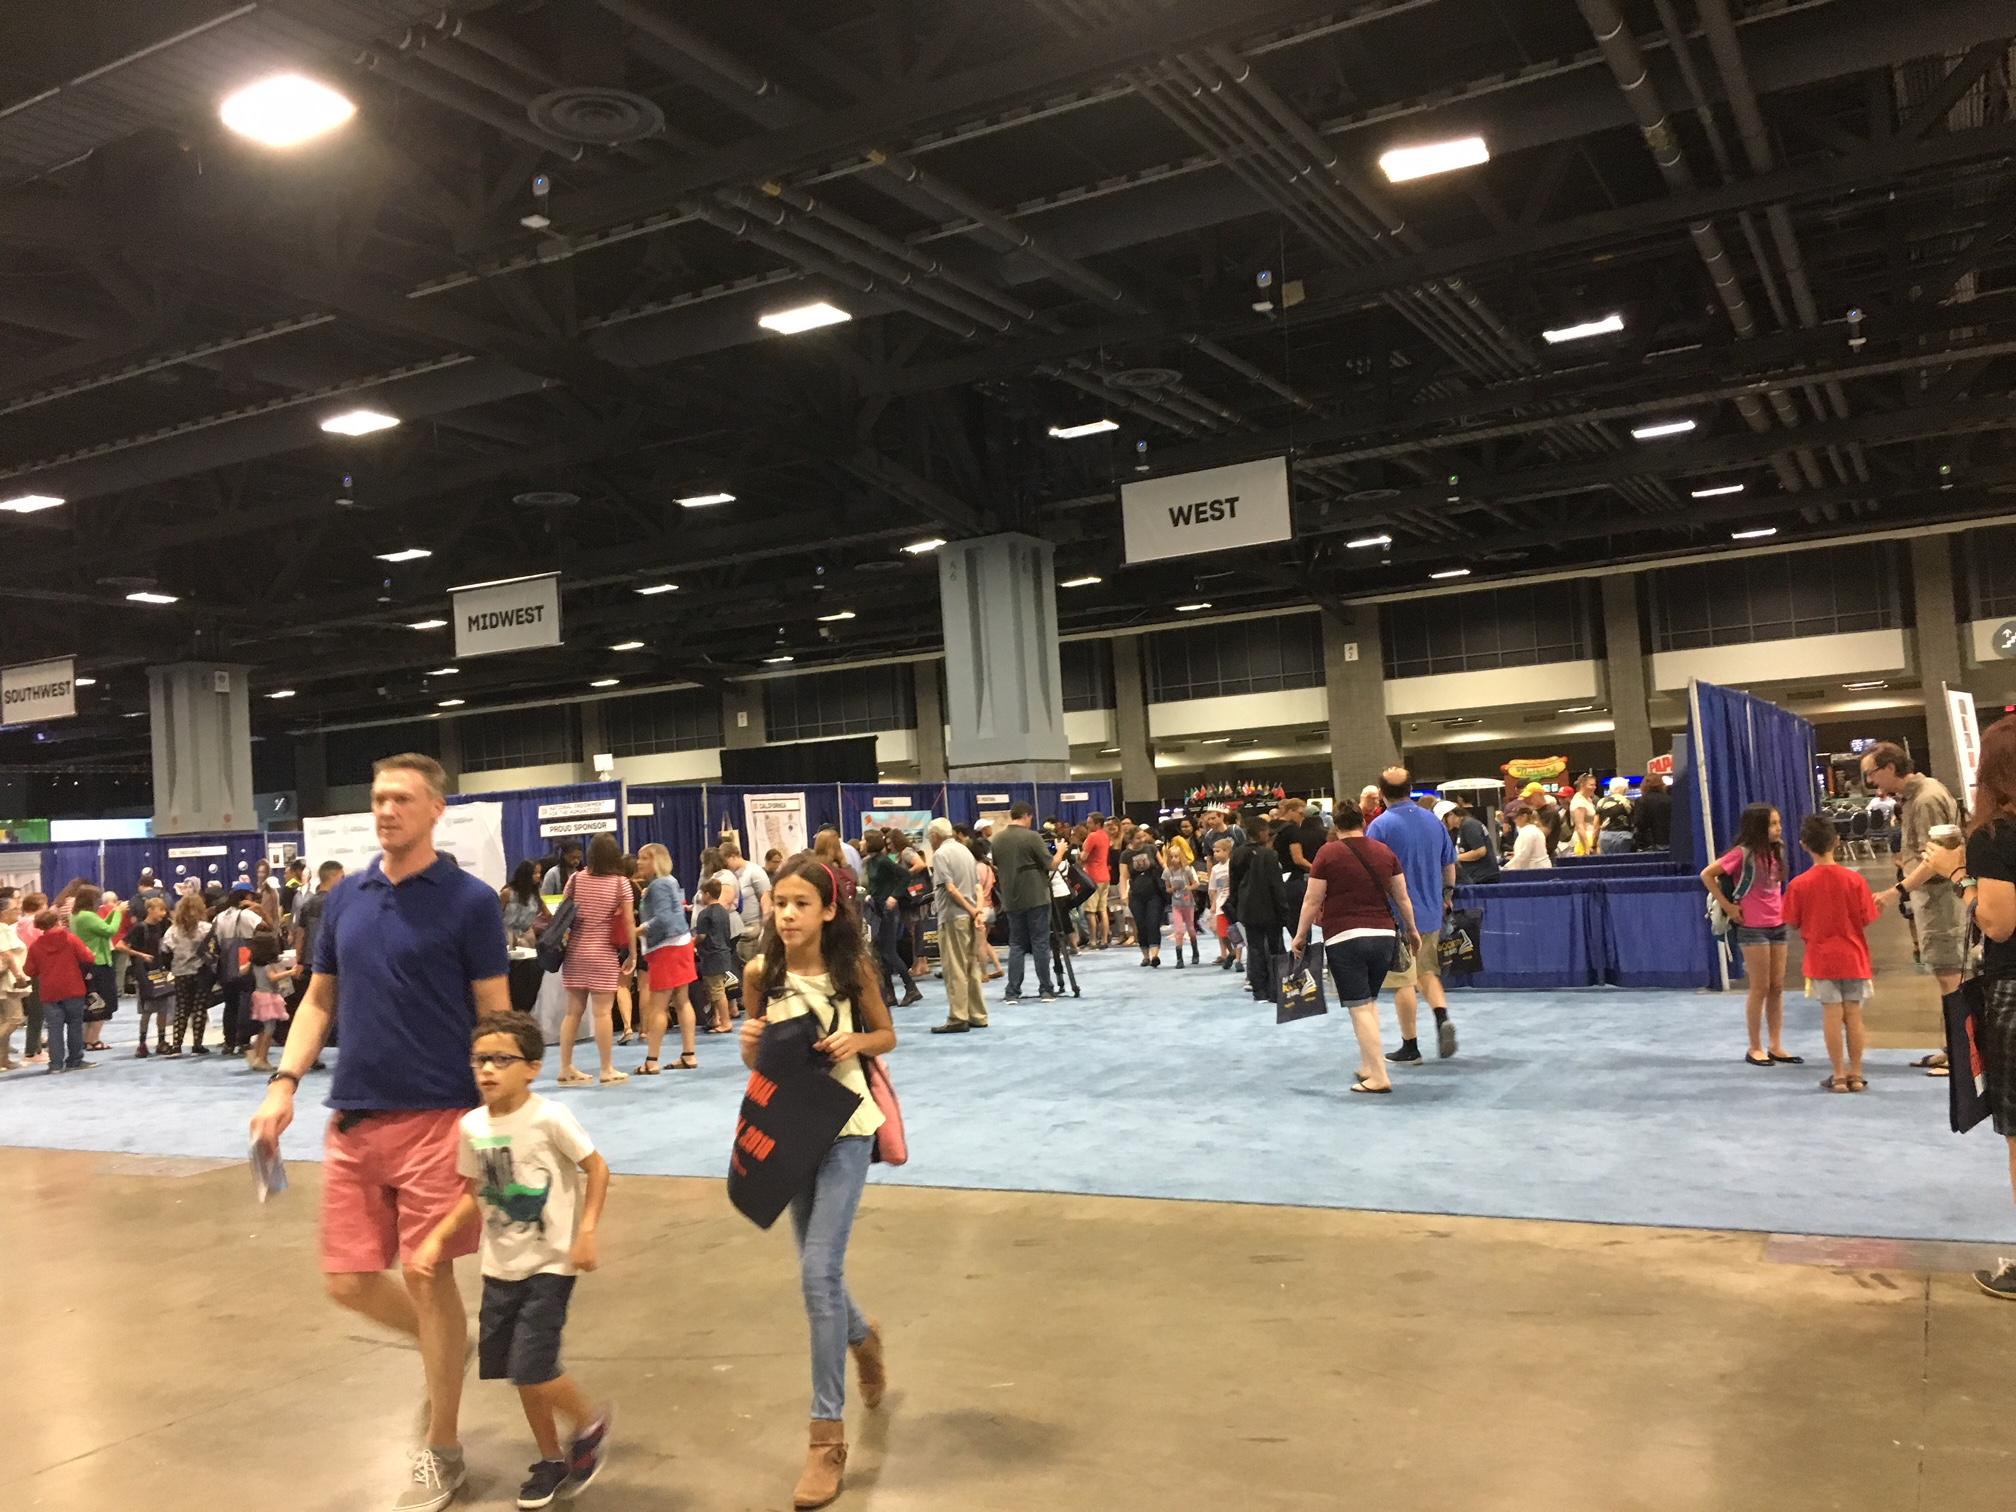 A view of the Walter E. Washington Convention Center floor